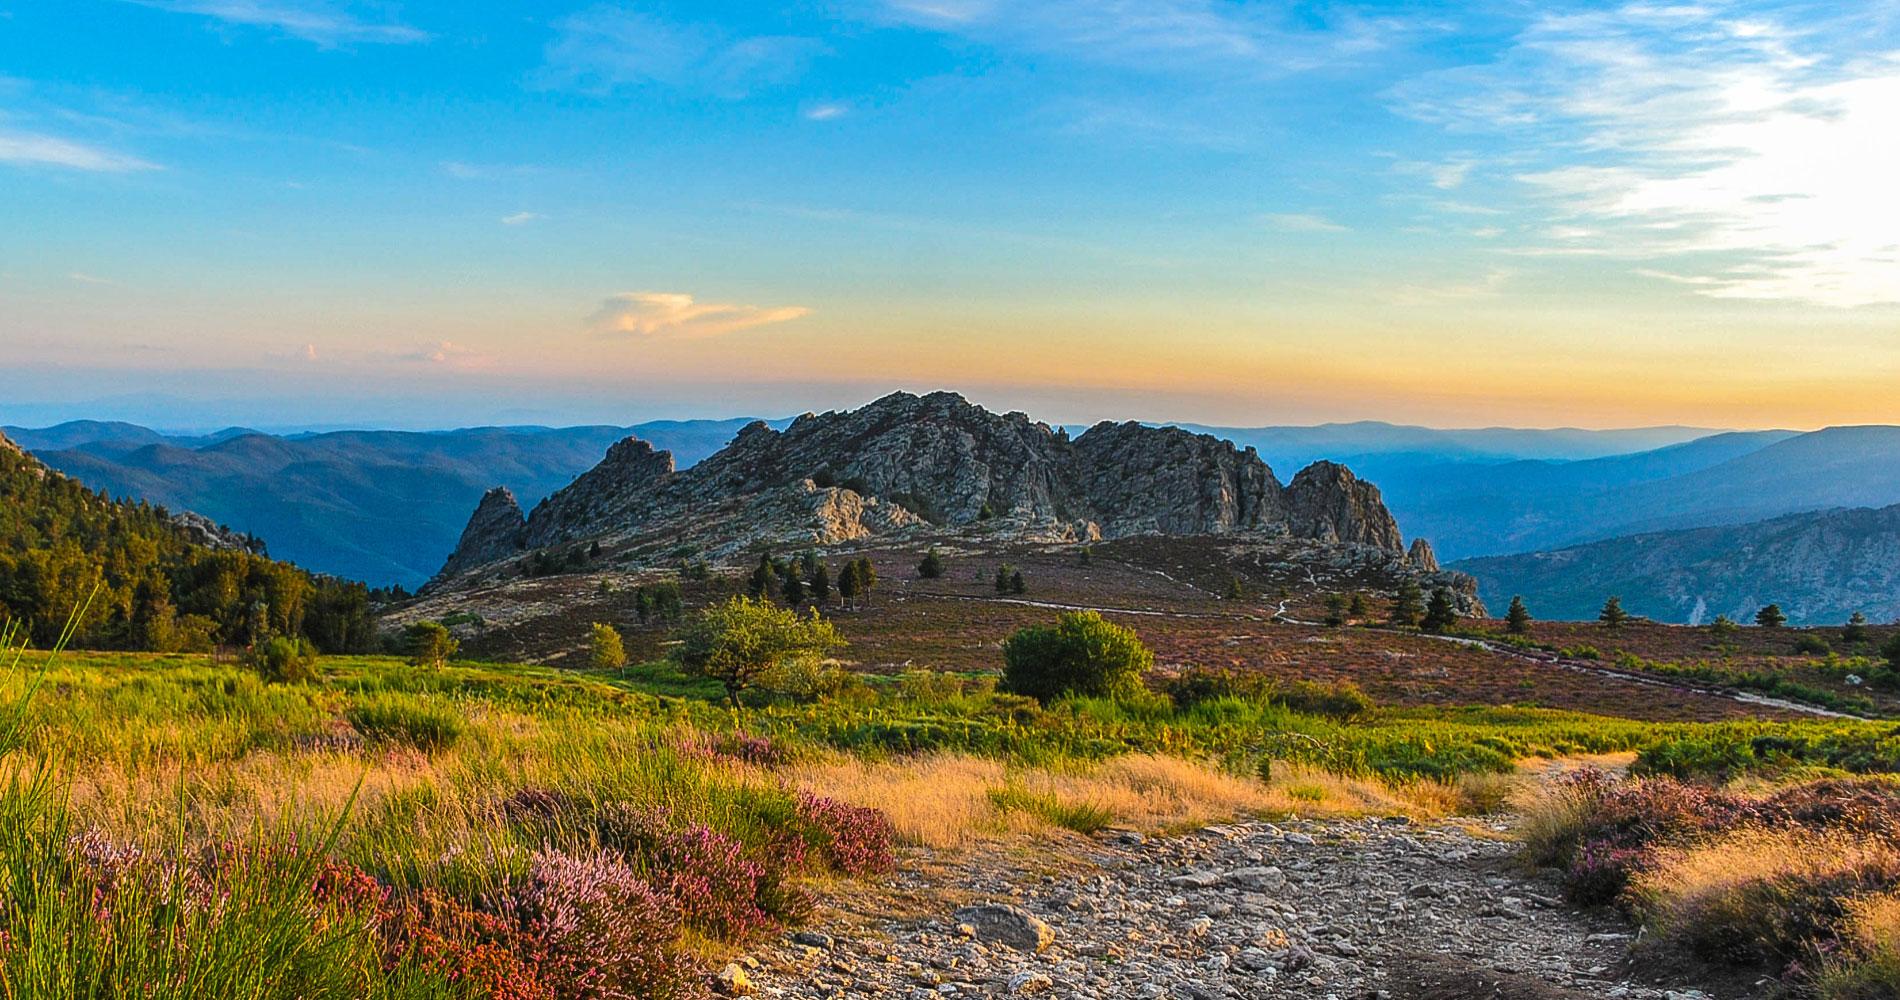 Montagne du Haut Languedoc. Caroux slider